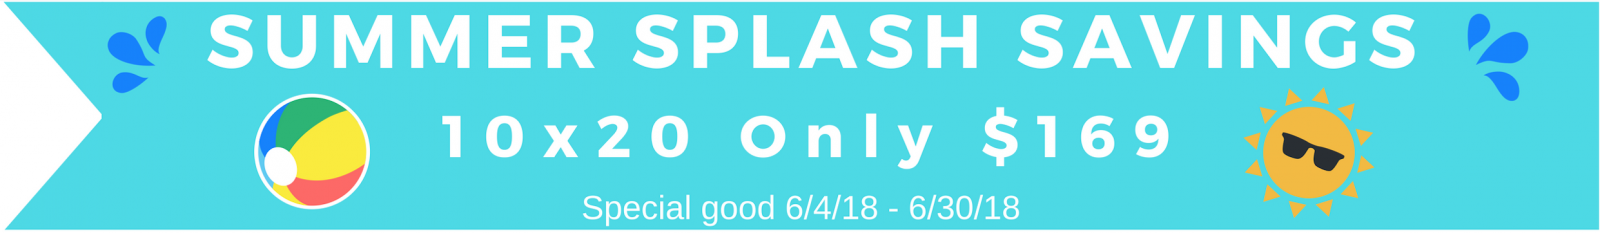 Summer Splash Savings! 10x20 Only $169